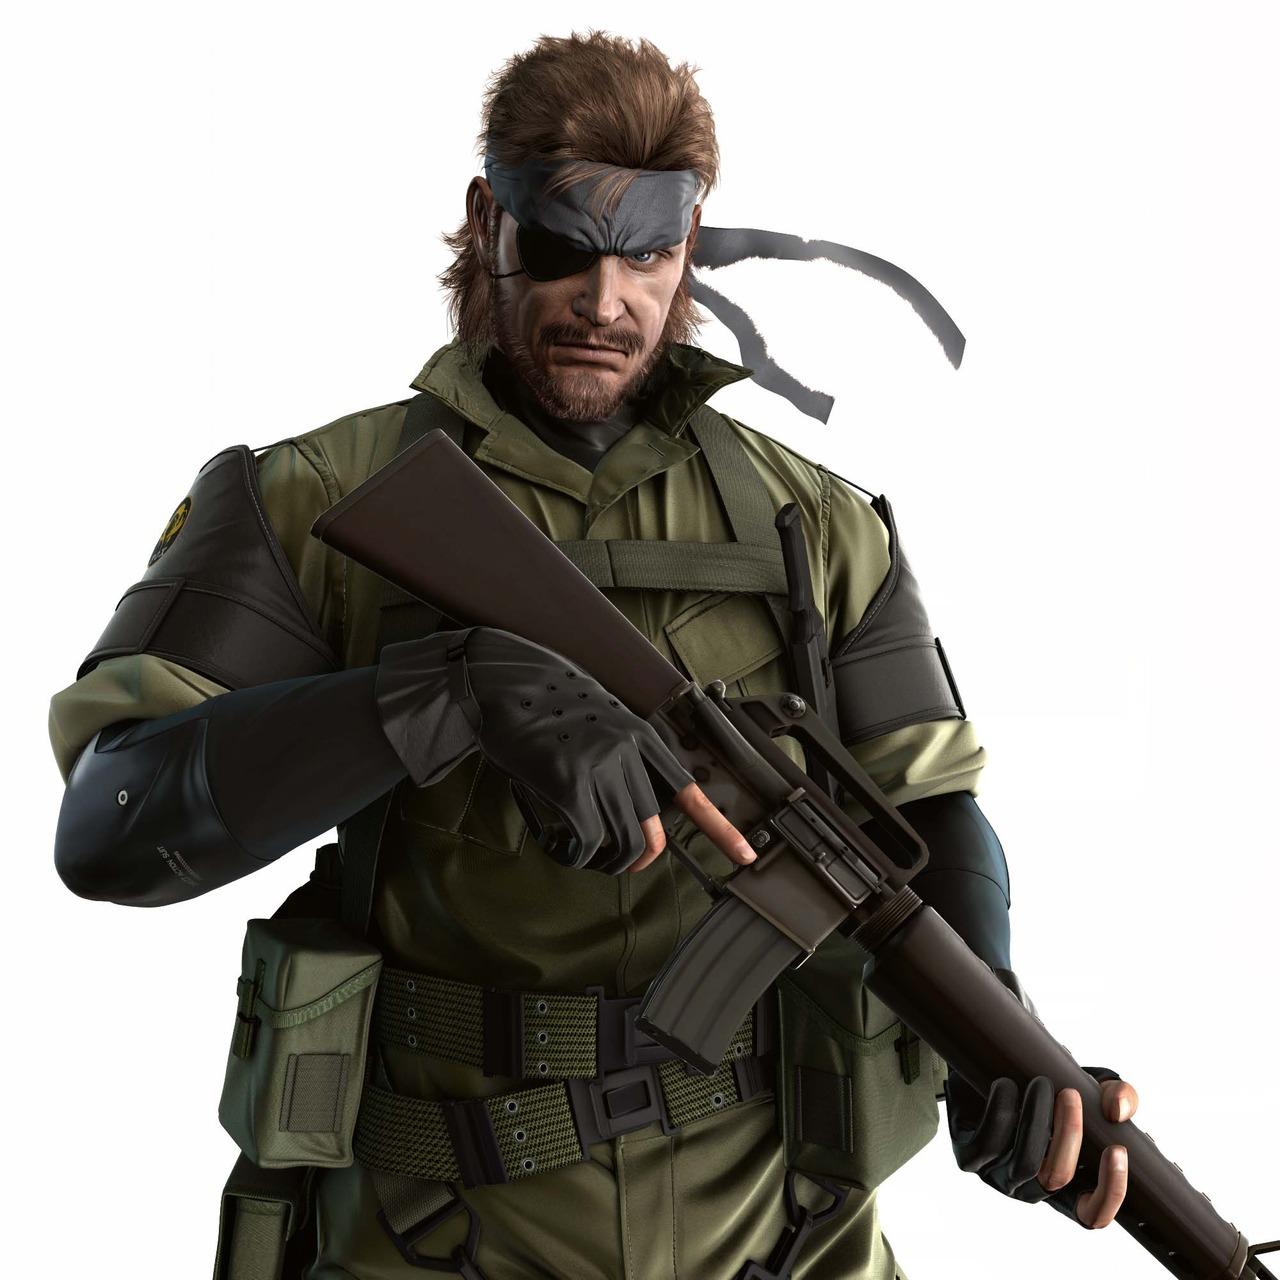 [Test] Metal Gear Solid Peace Walker - 2010 - PSP Metal-gear-solid-peace-walker-playstation-portable-psp-089